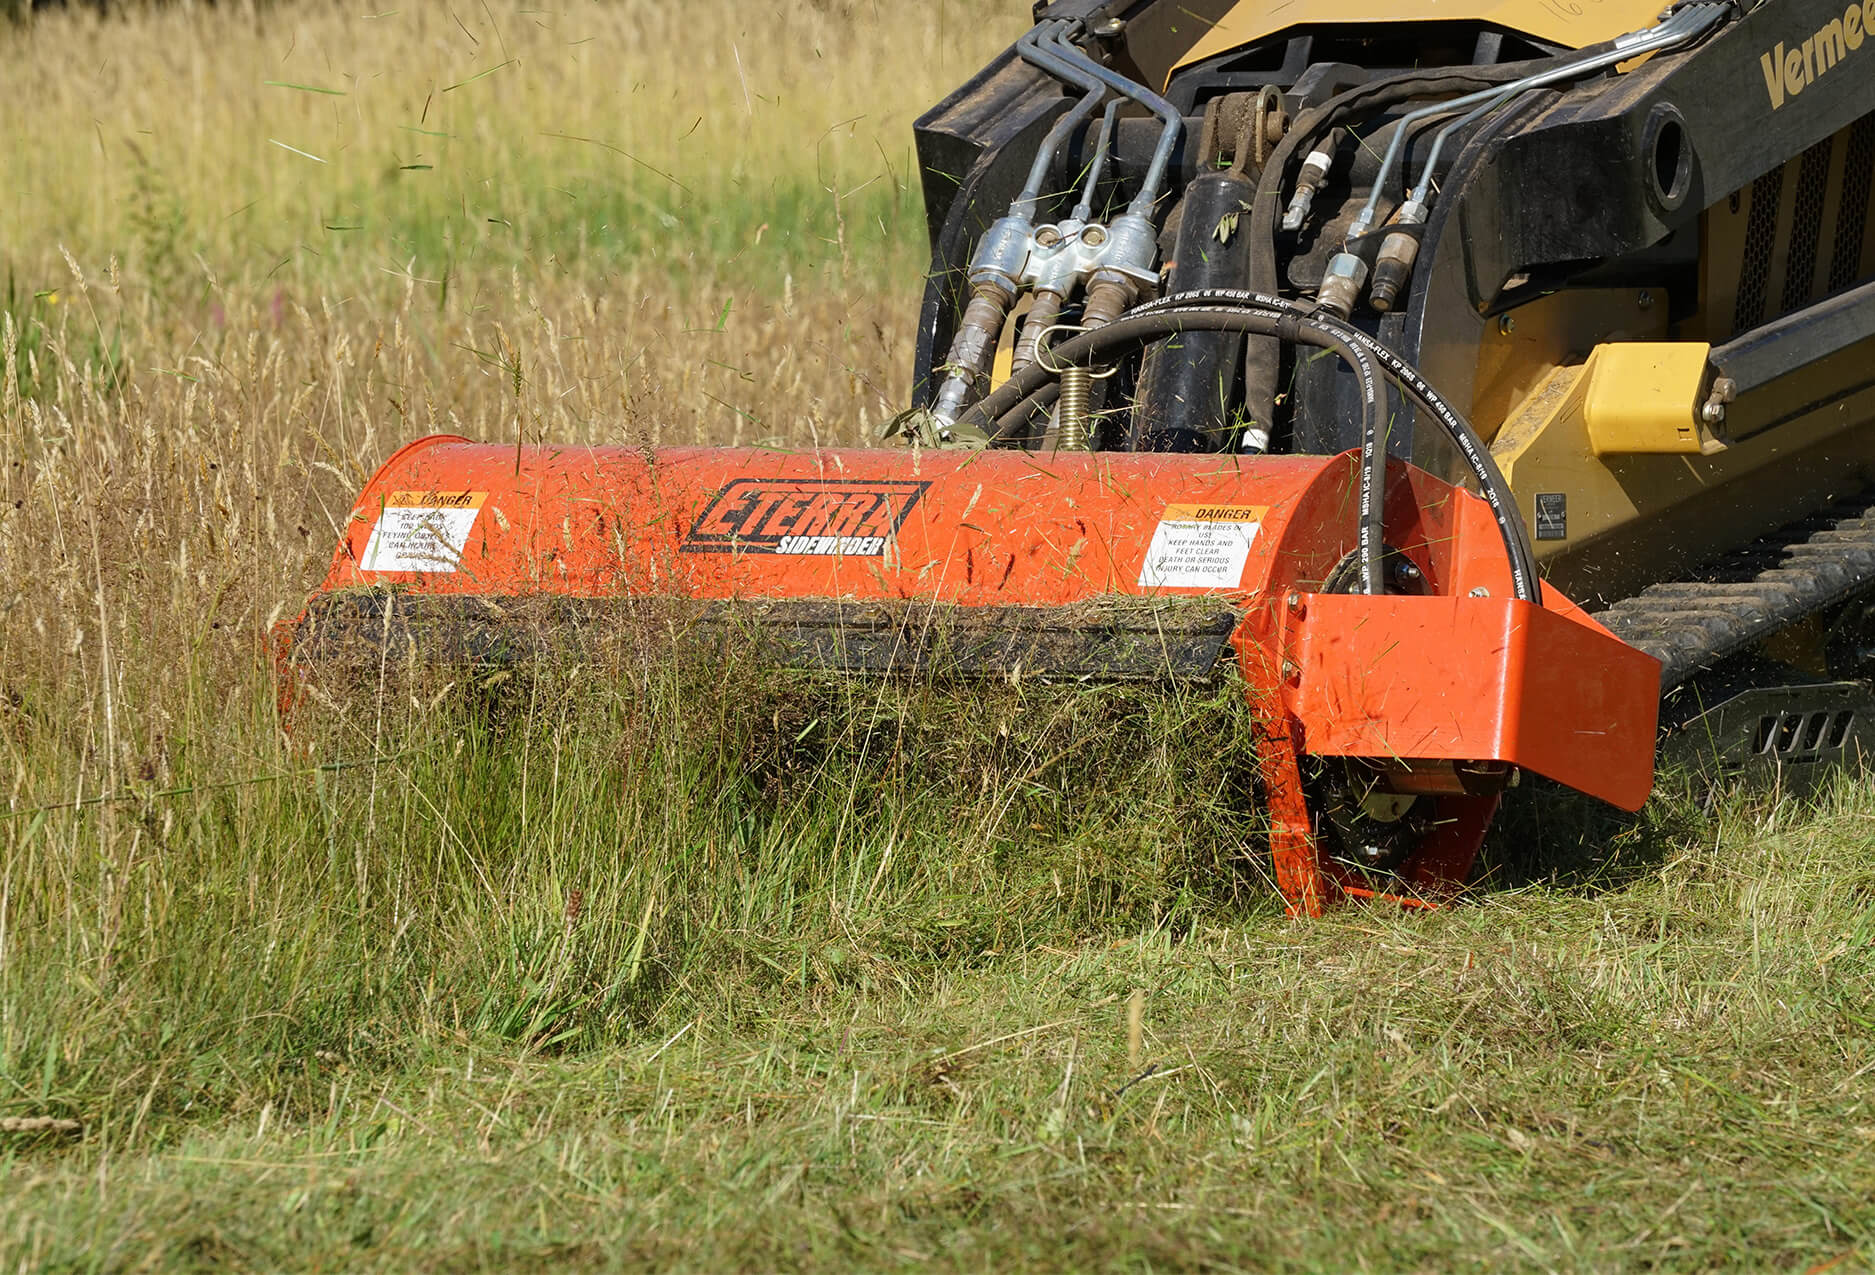 Eterra Sidewinder mini Skid Steer flail mower mowing grass close up